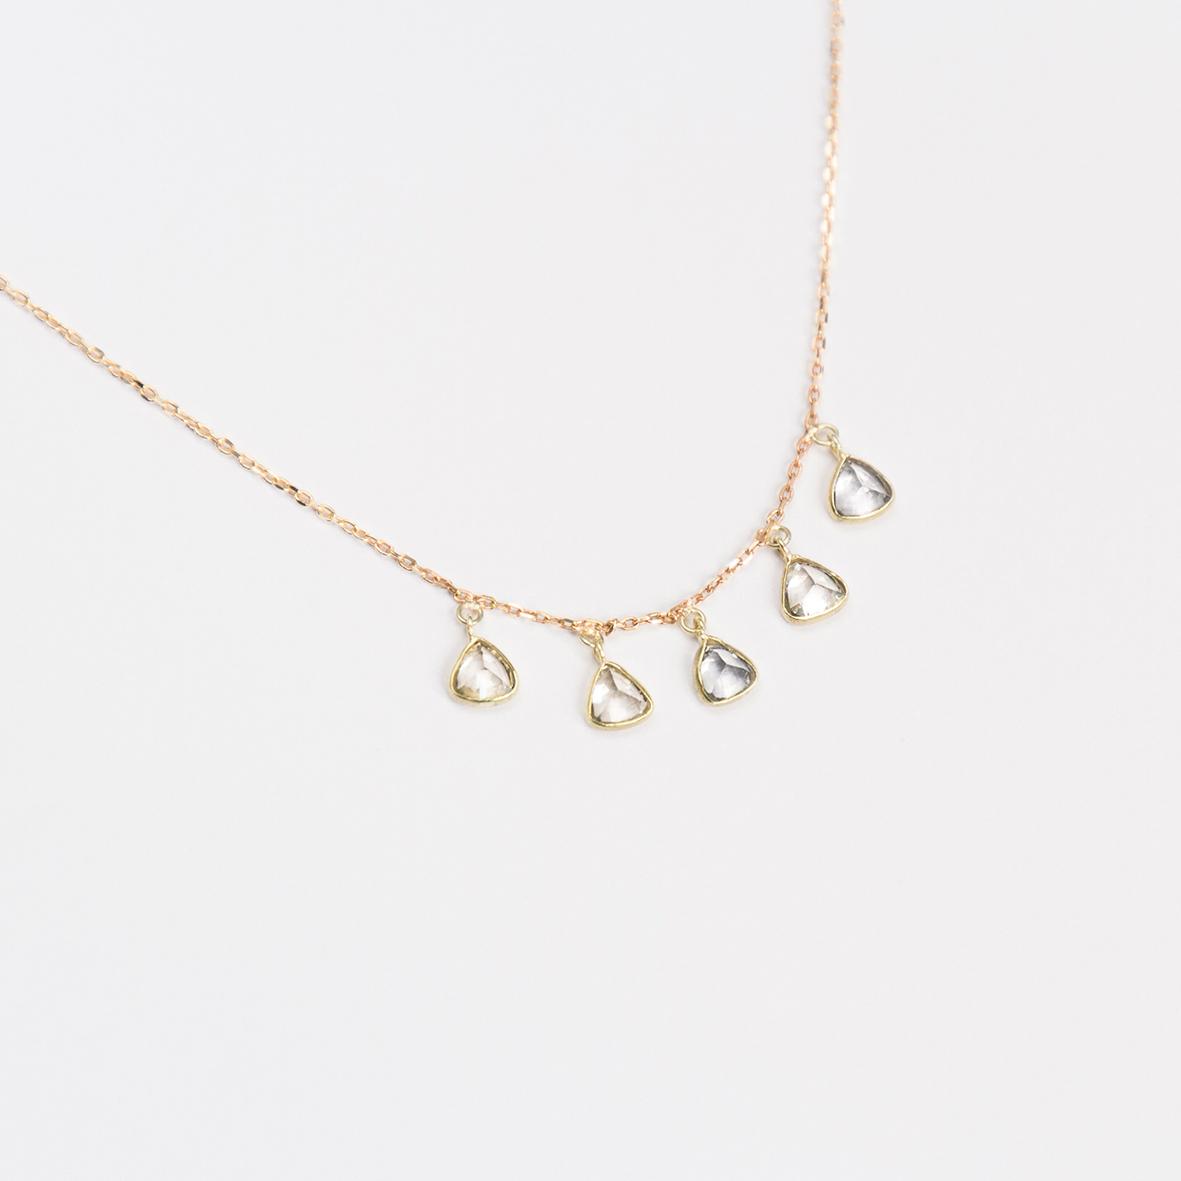 3. OONA_philo_ficha2_sapphire five triangles necklace